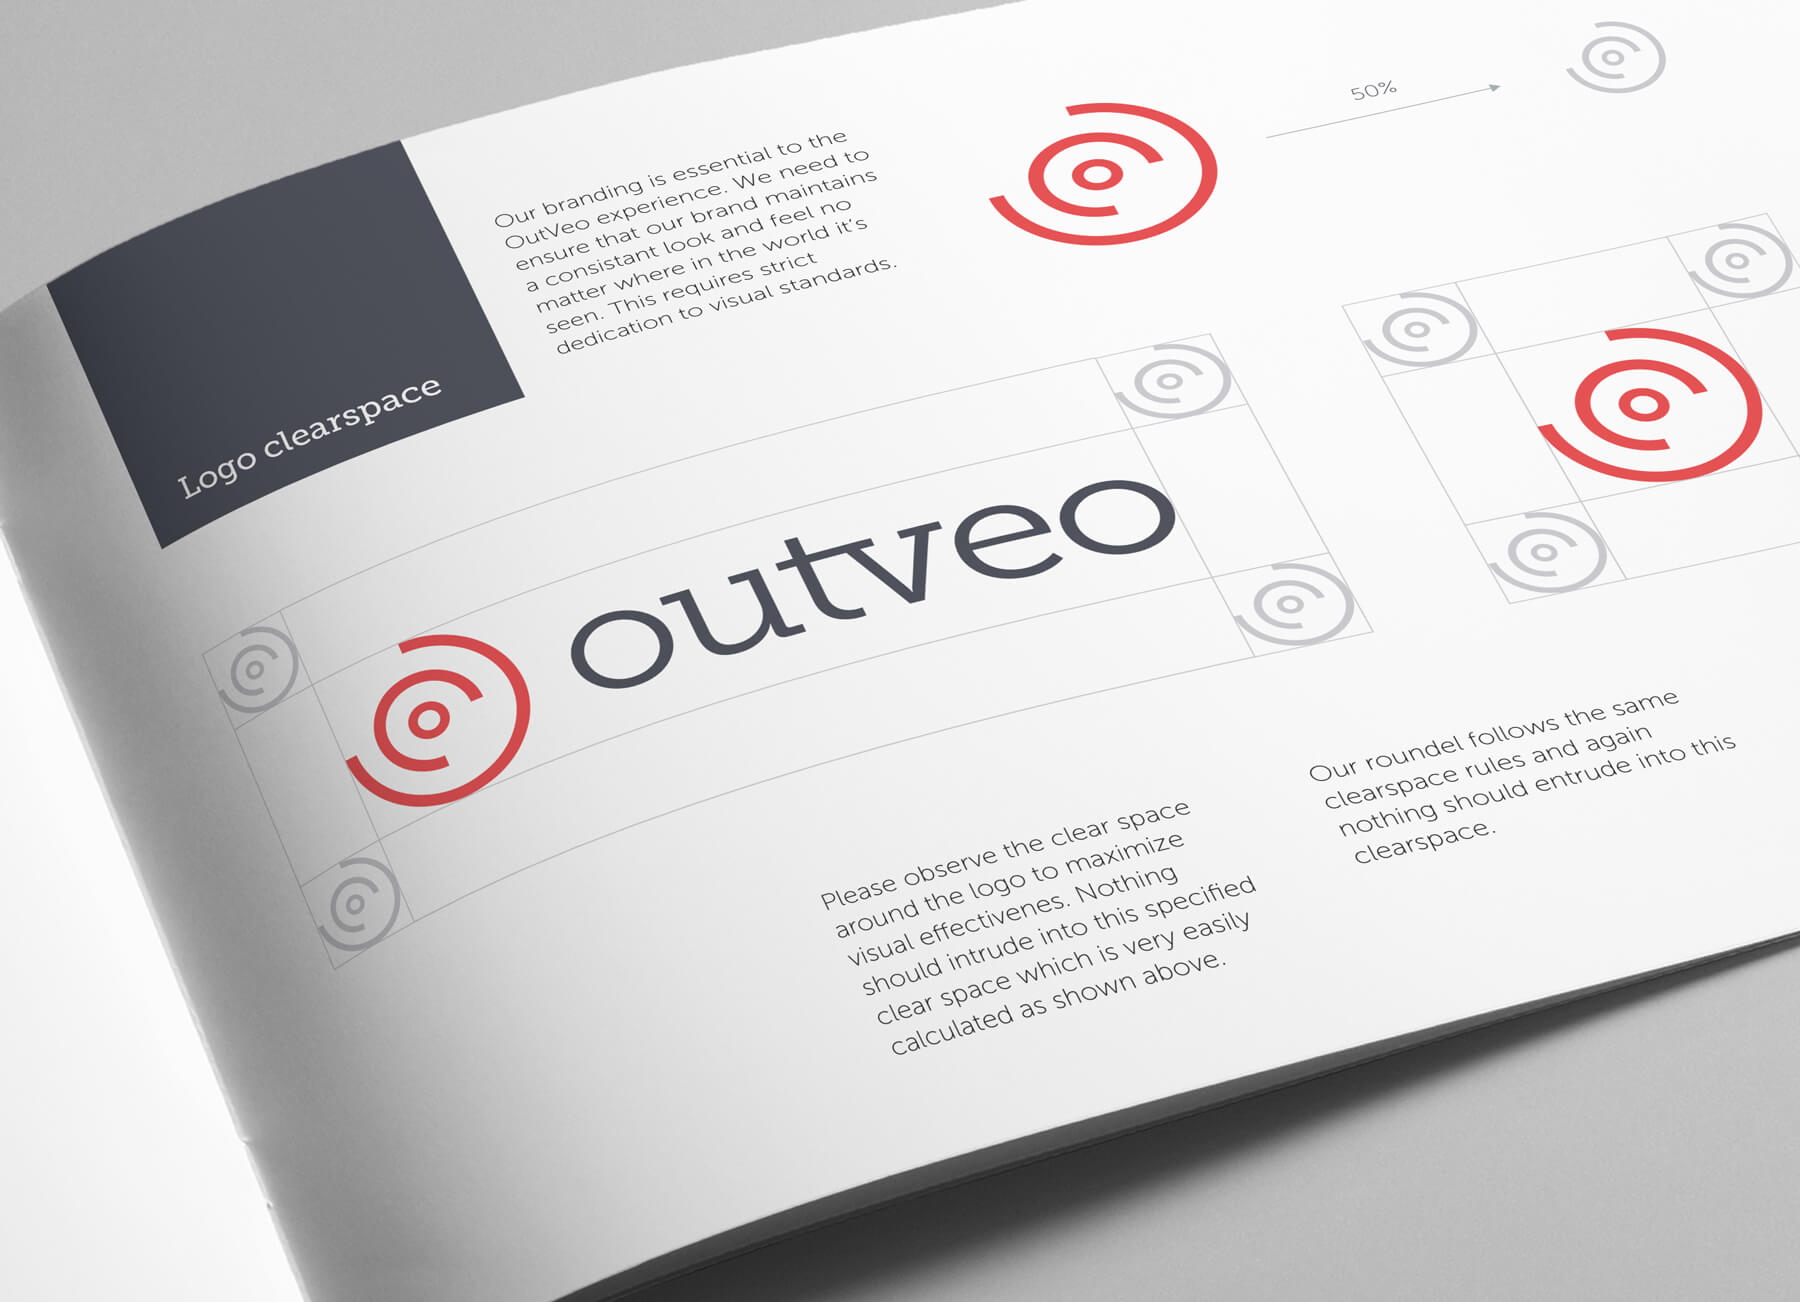 ourveo-brandbook-page.jpg